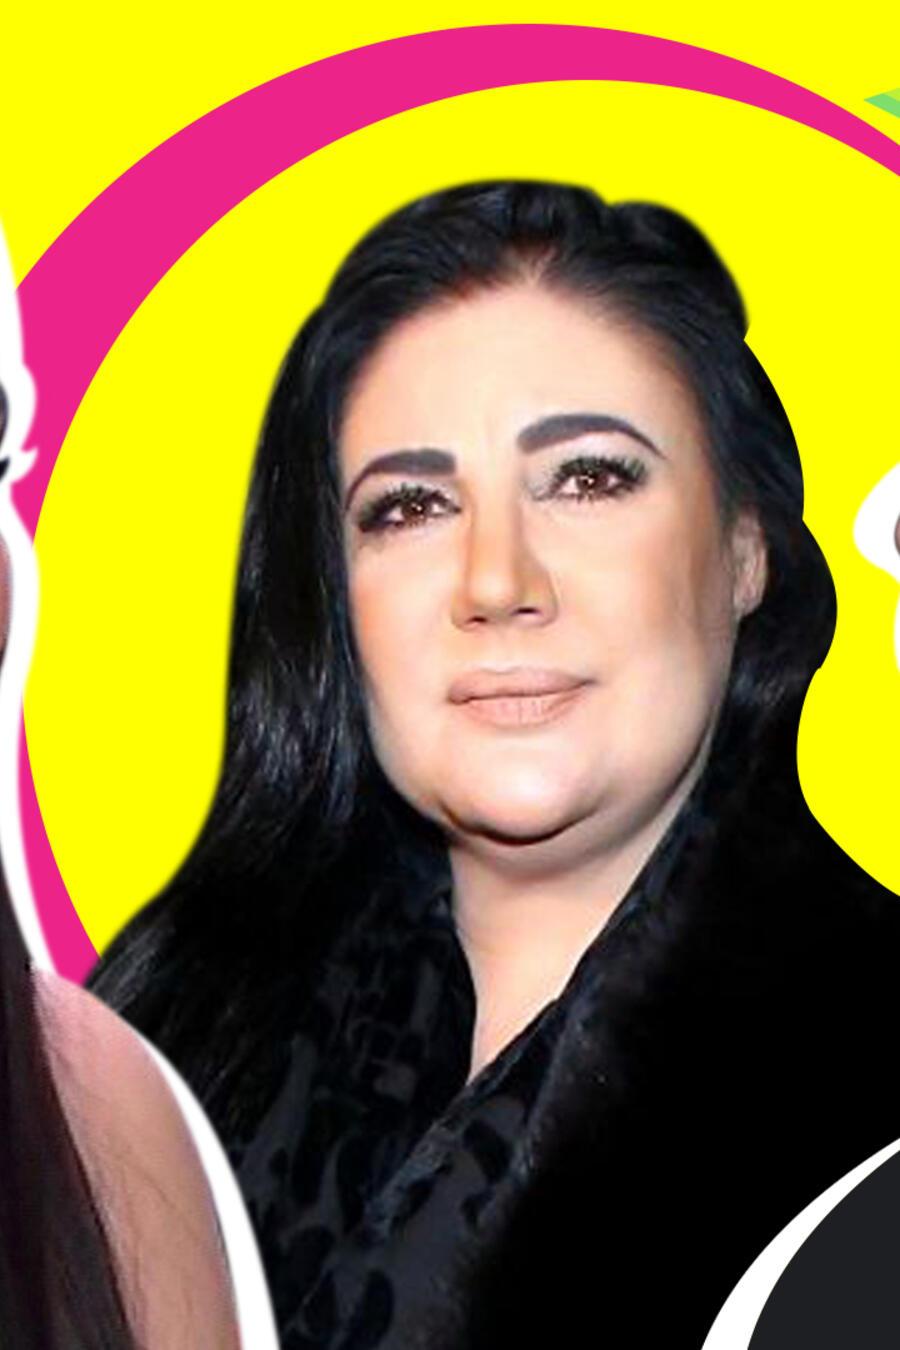 JoséJoel vs Sarita y Alejandra Ávalos